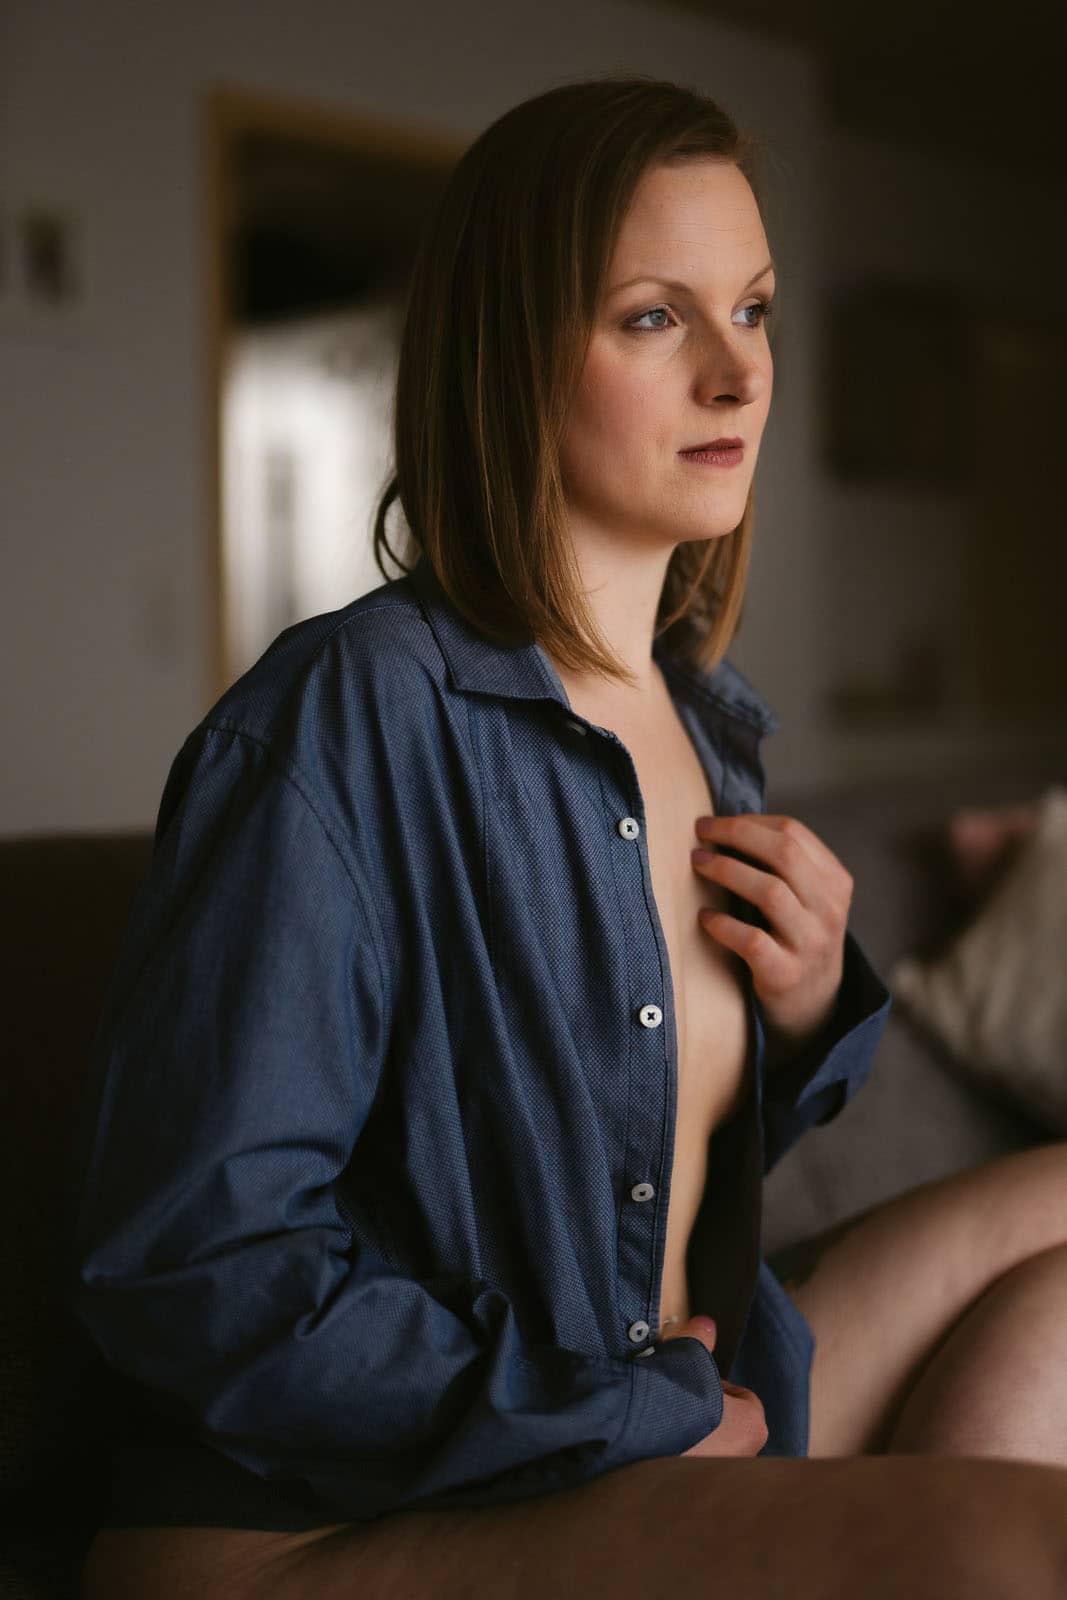 boudoir homeshooting causal